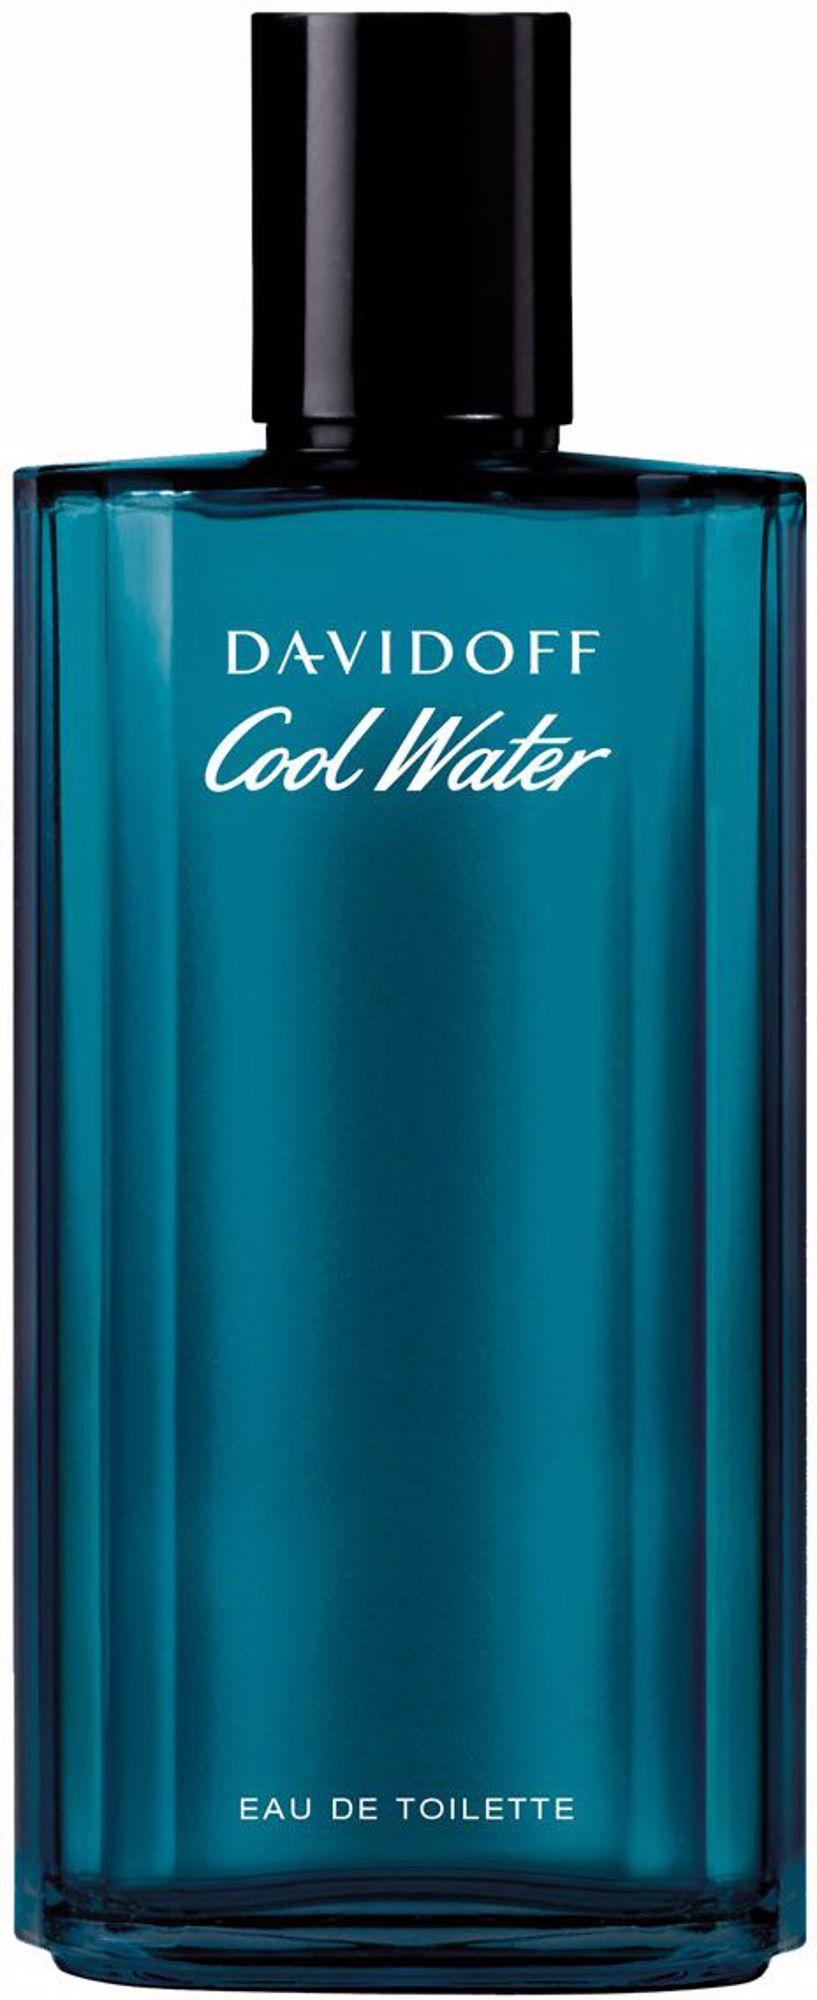 Cool Water Man Eau De Toilette